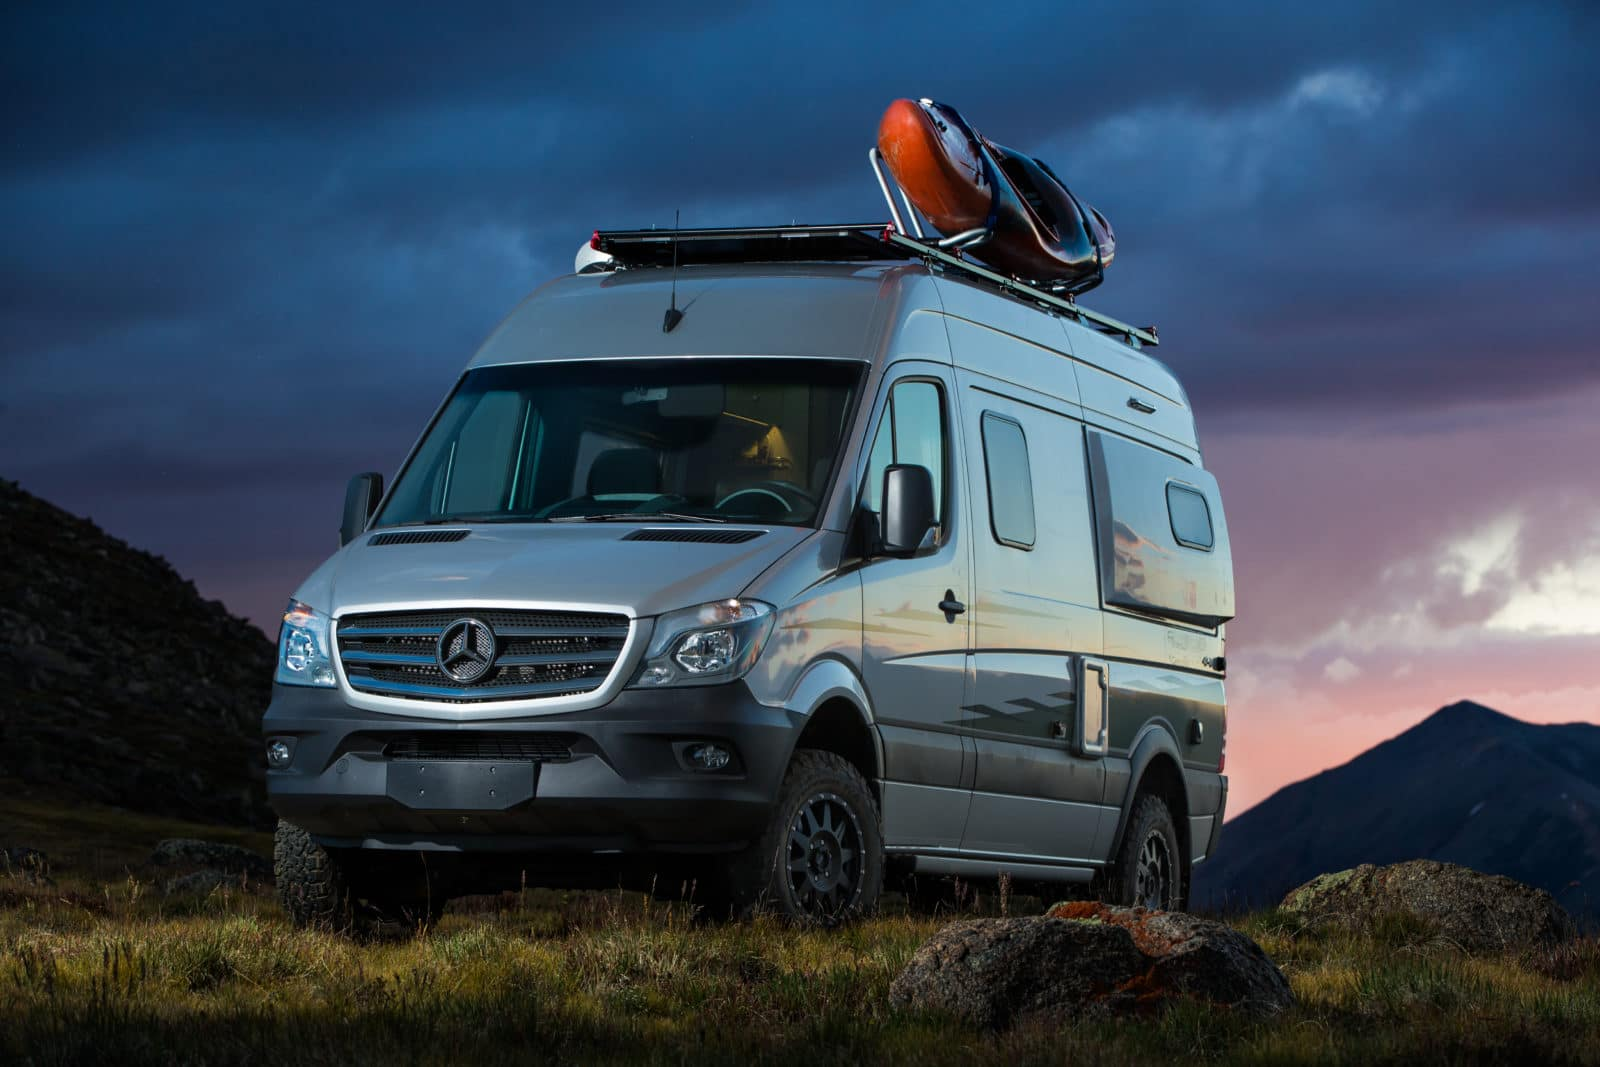 Mercedes Sprinter Rv >> Winnebago Revel 4x4 Mercedes Sprinter Van Rv We Love To Explore